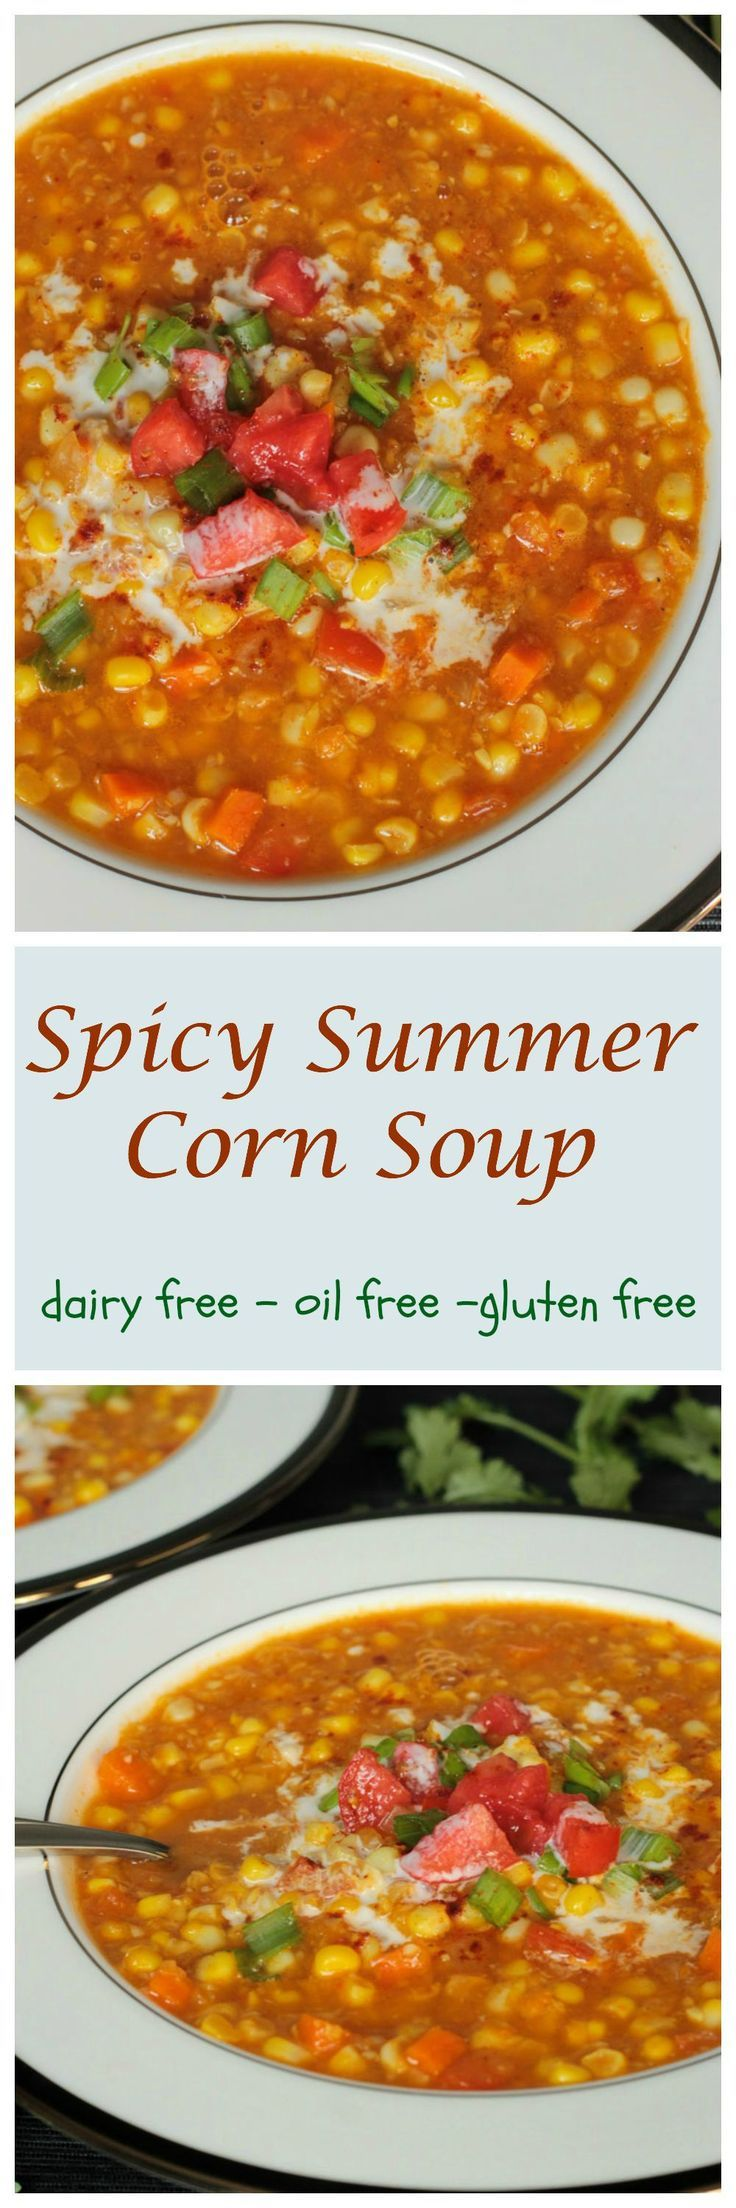 17 Best images about Soups & Stews on Pinterest | Black ...